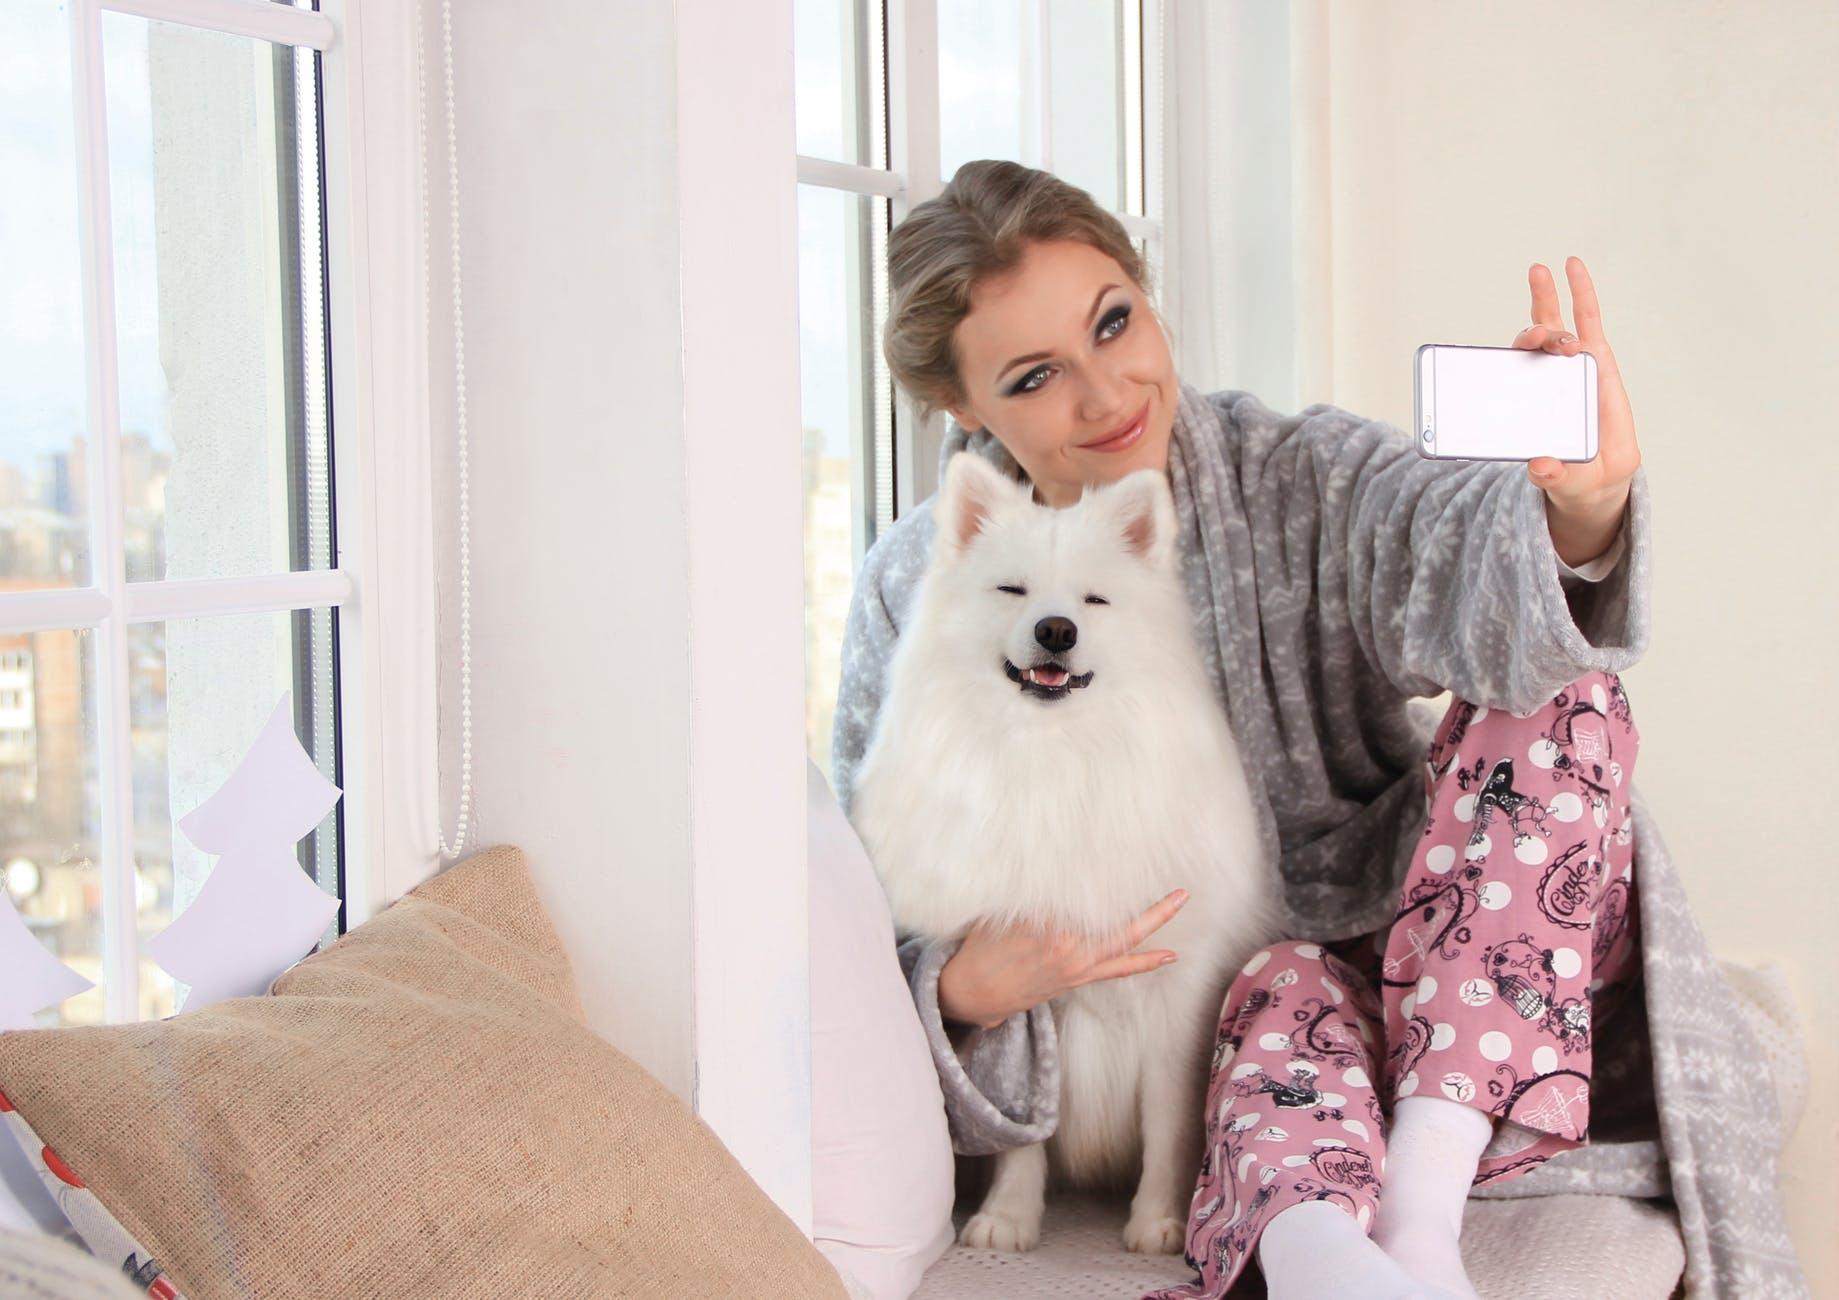 fotke koje sheramo na društvenim mrežama  woman taking a photo of herself with white dog